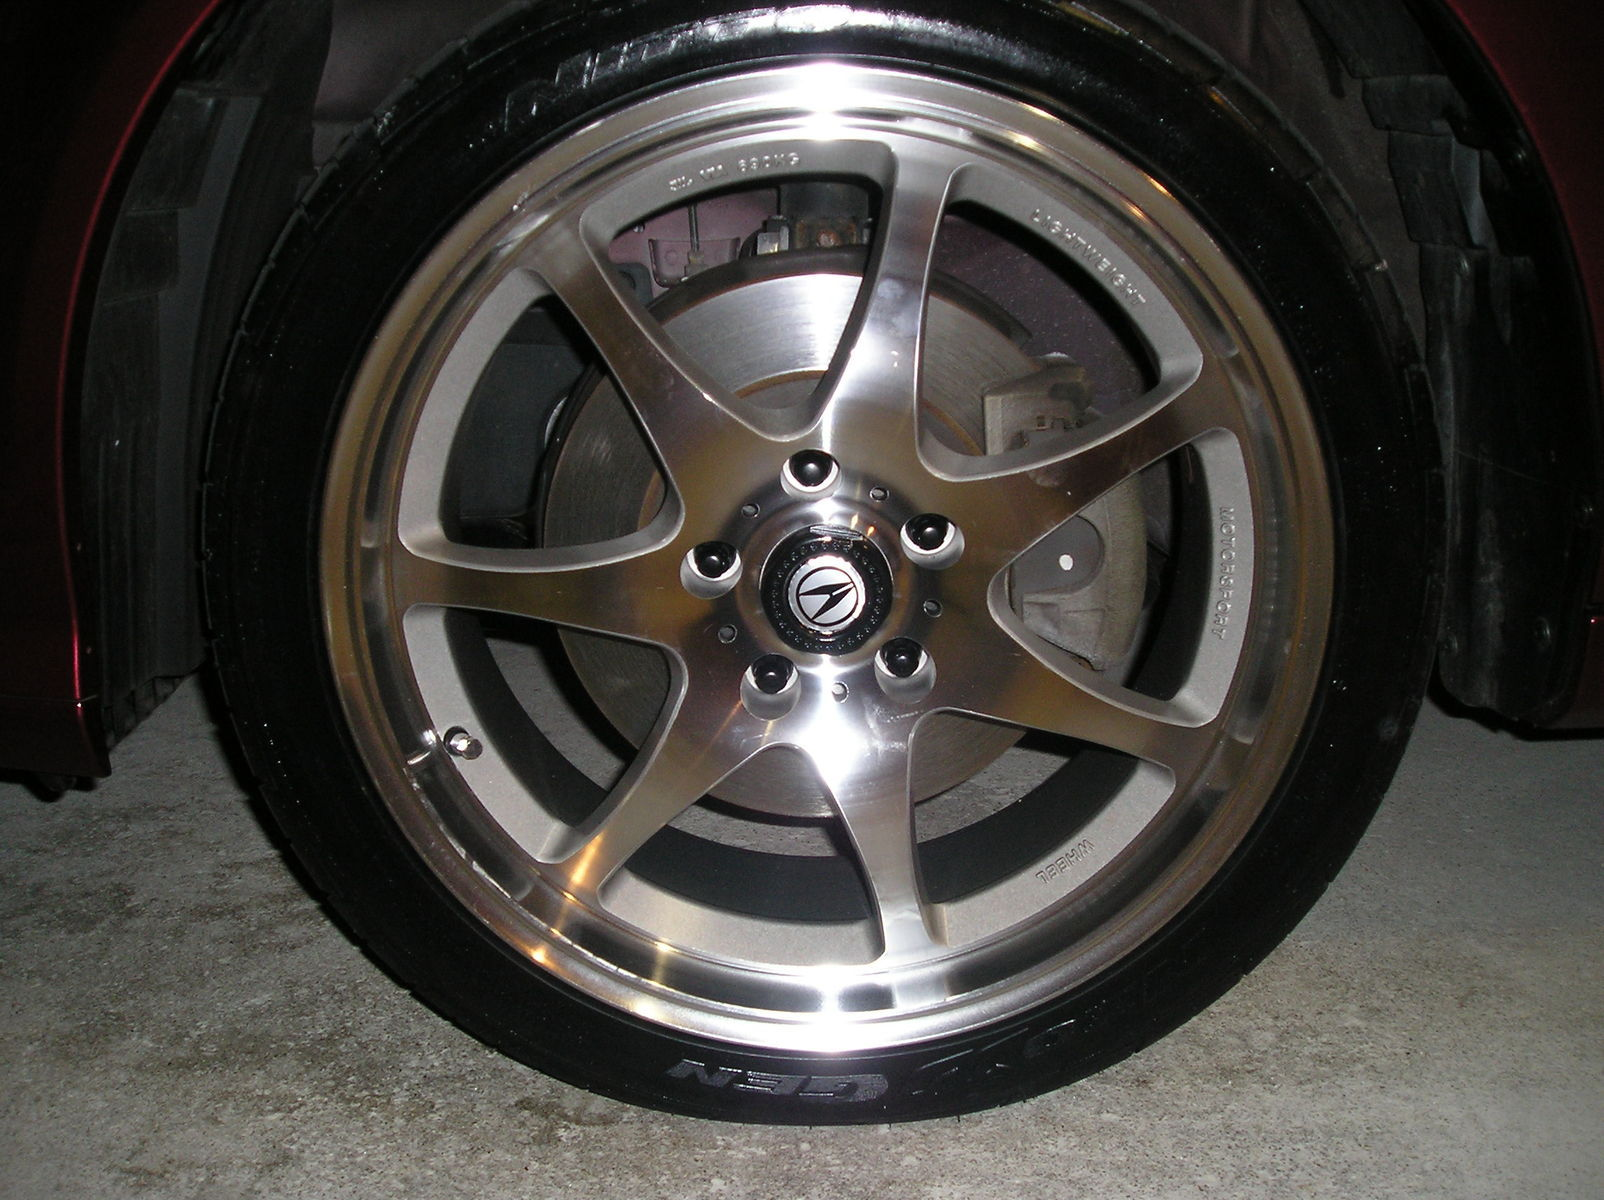 2003 Acura RSX | Acura RSX Type S